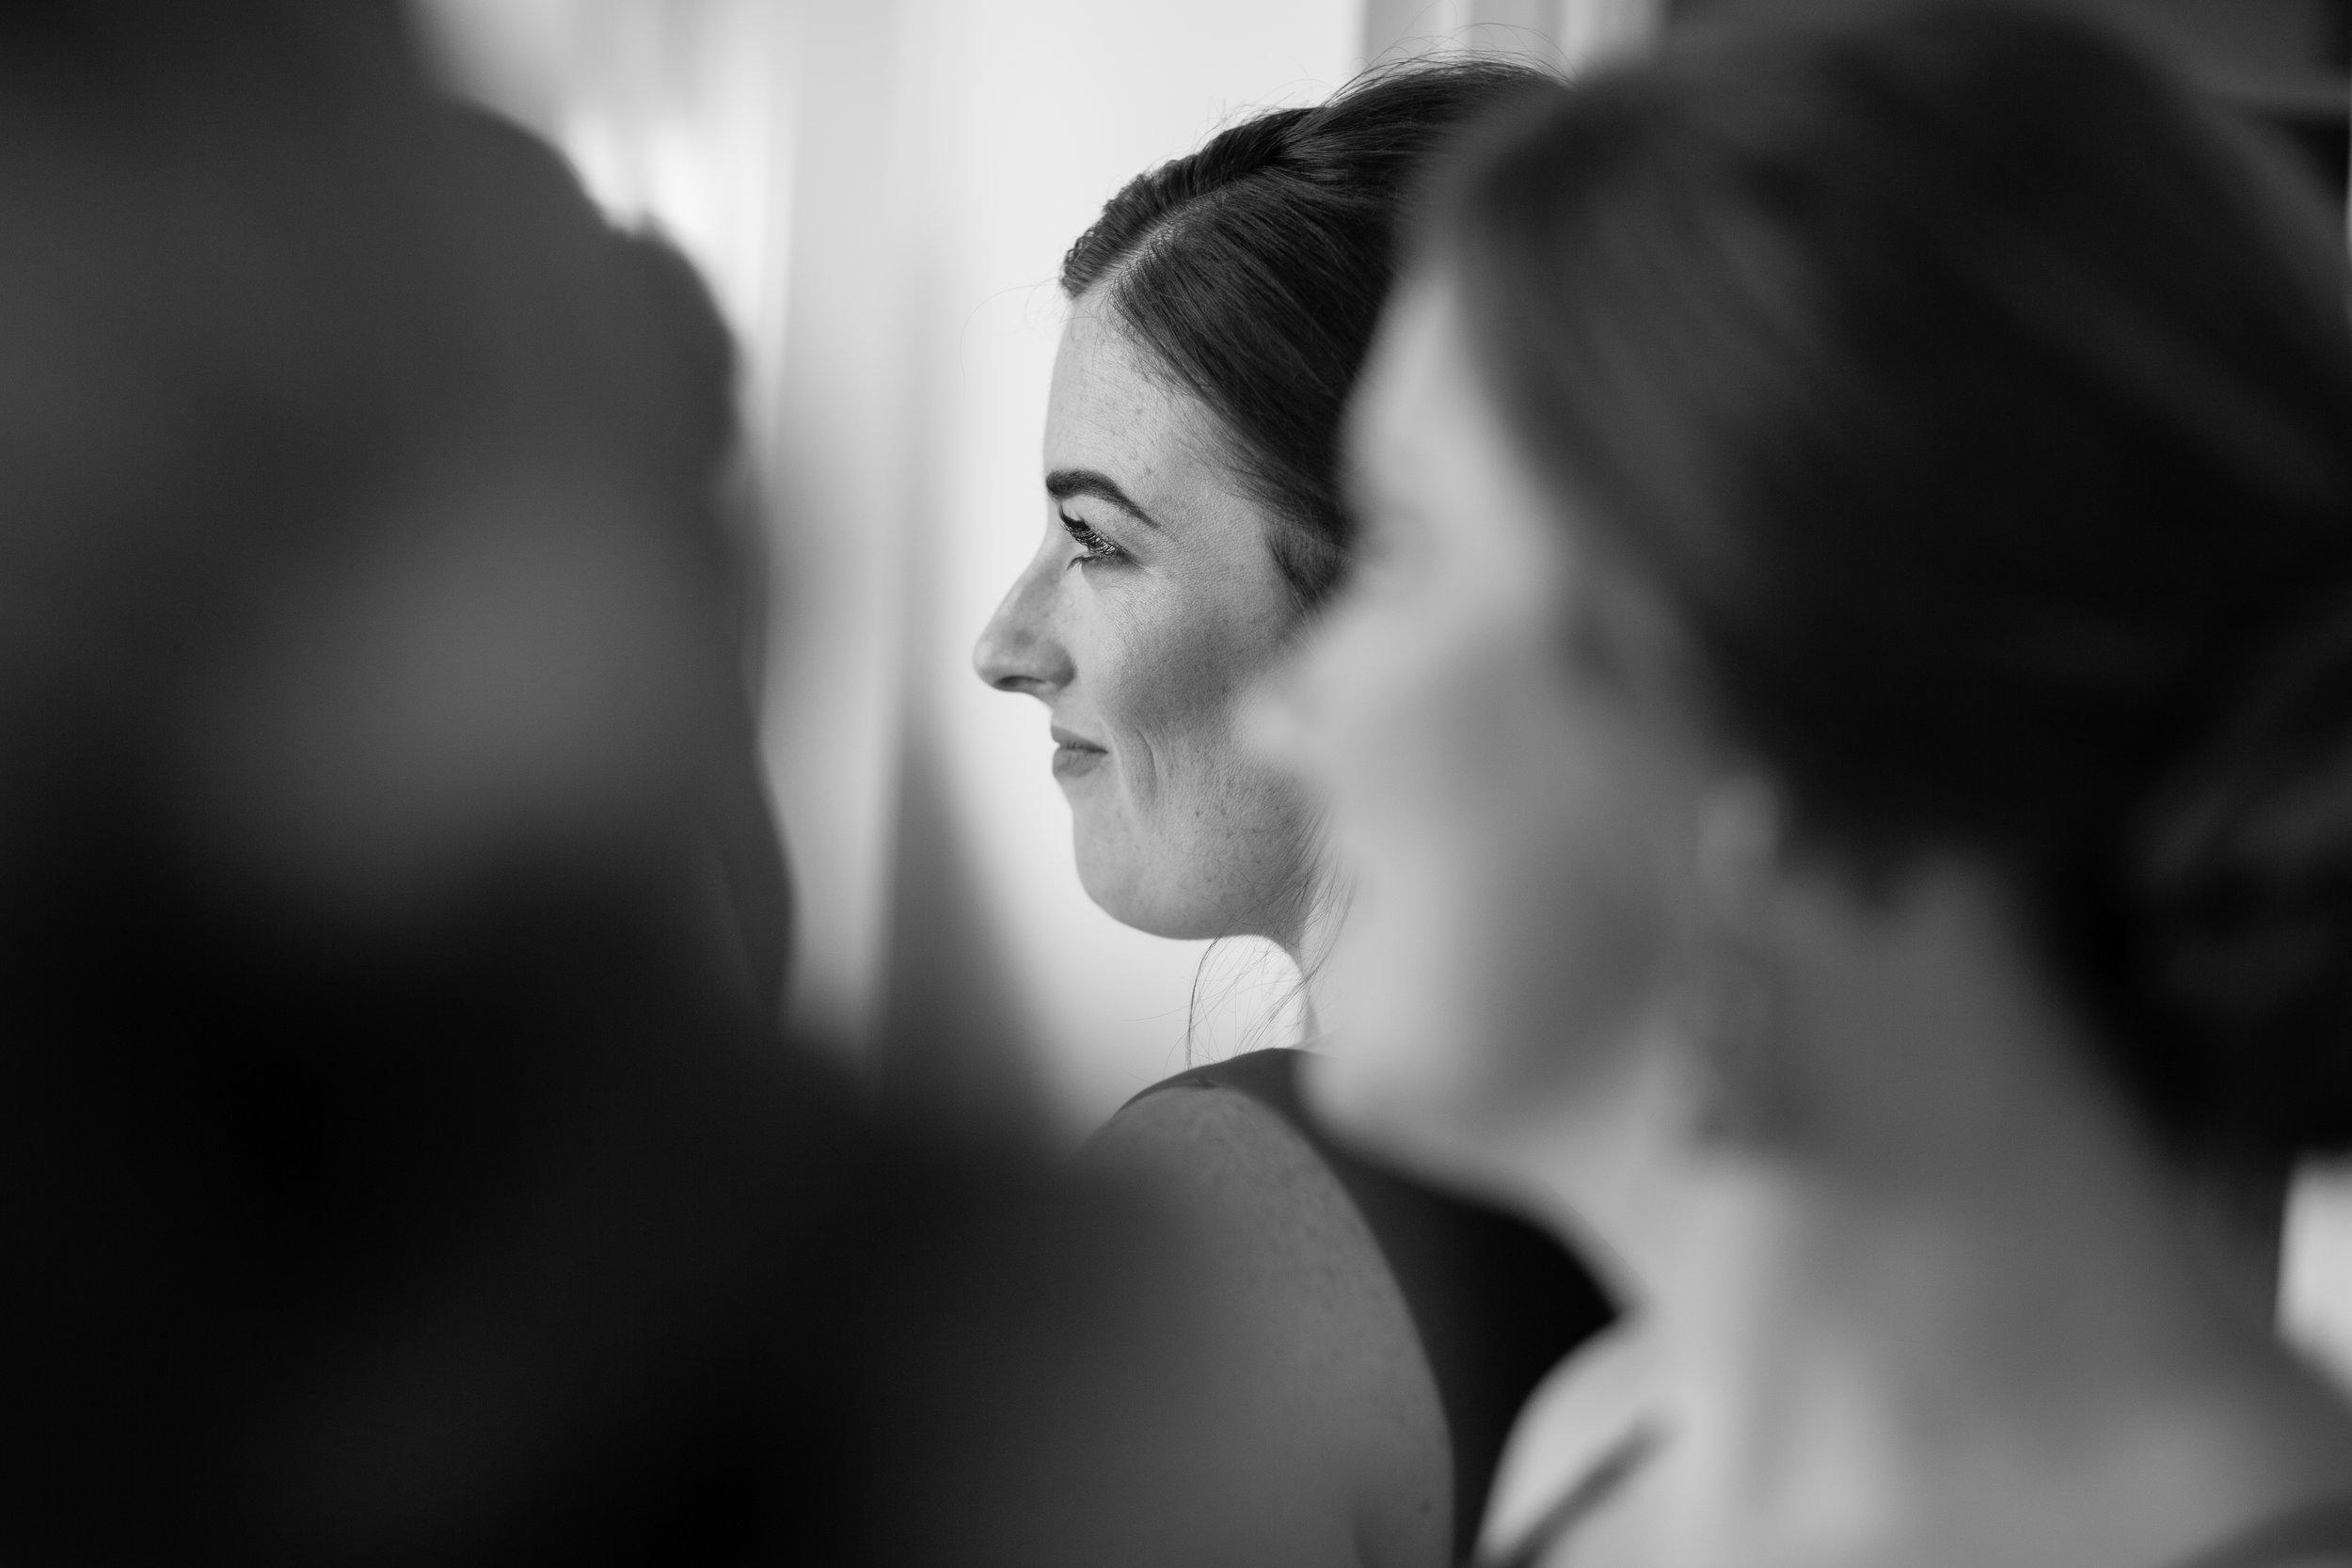 brisbane-city-wedding-photography-bride-1.jpg